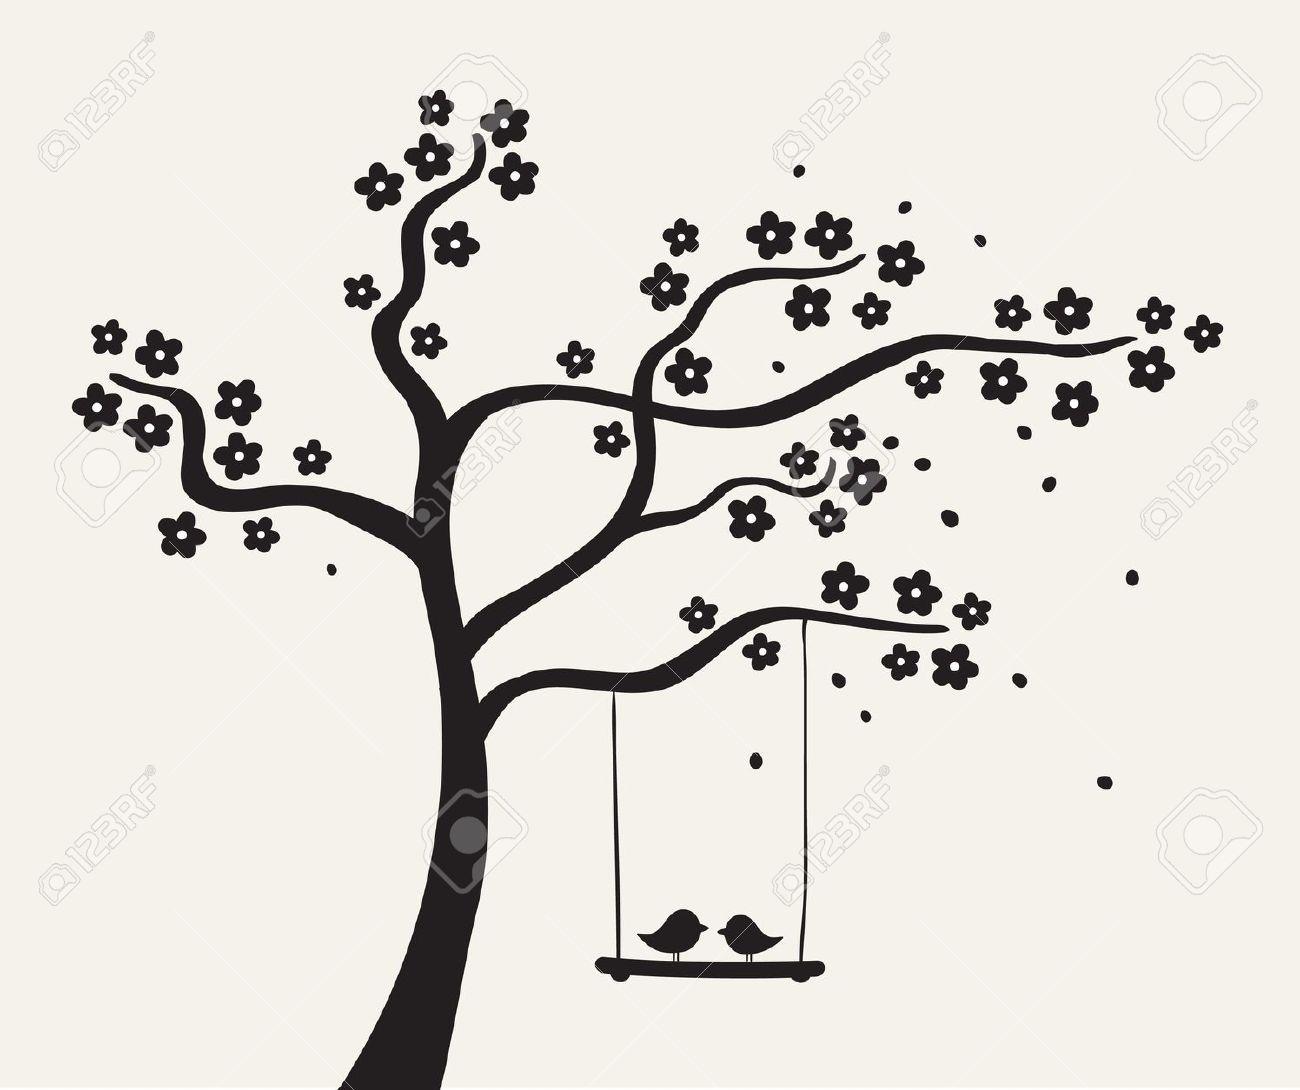 Illustration clipart tree bird silhouette Love Tree Tree Flower Free